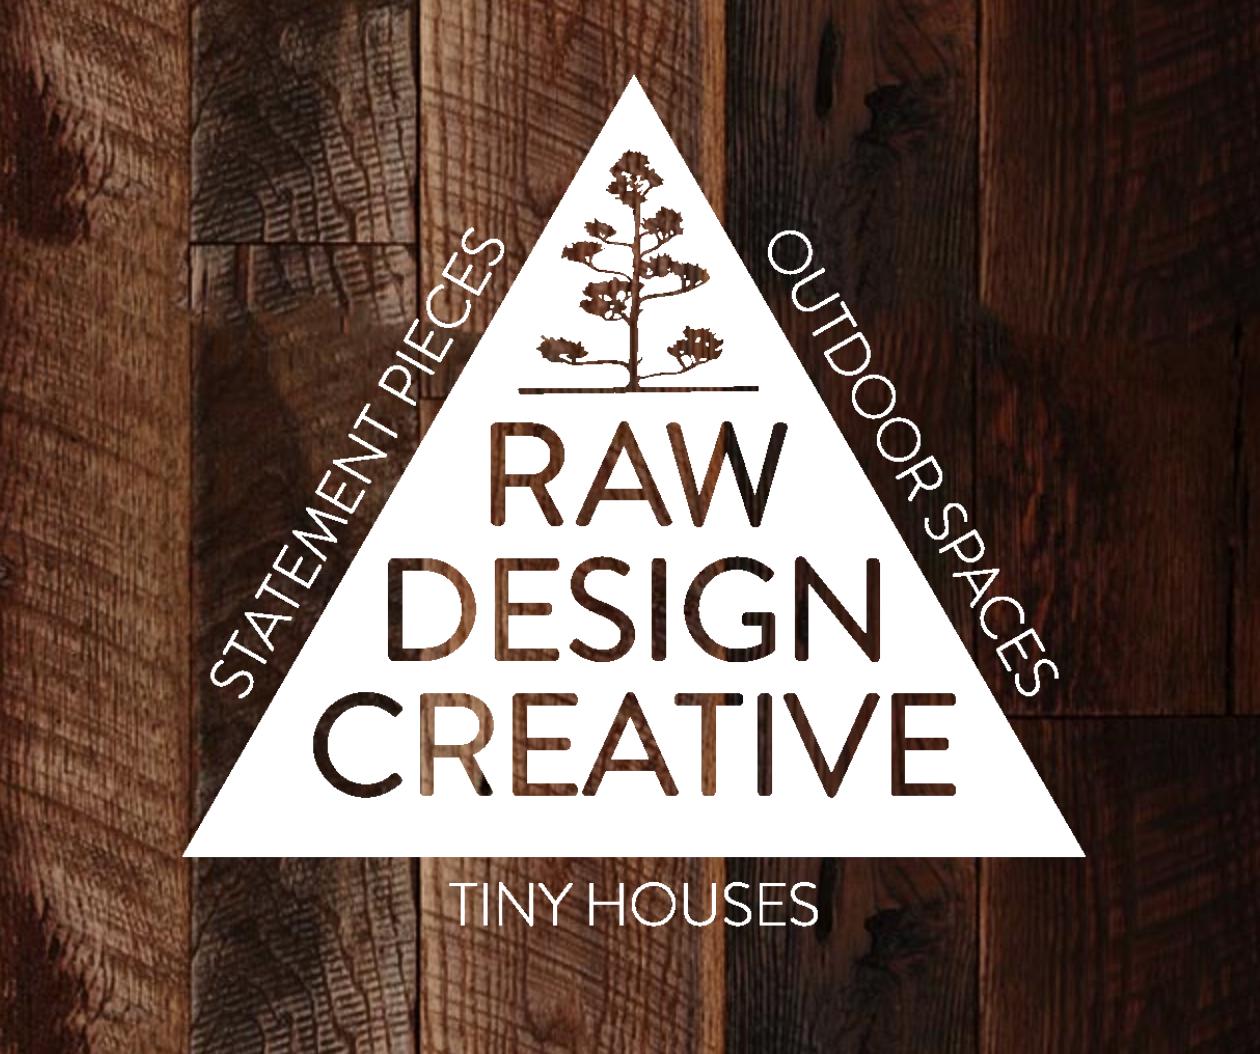 rawdesigncreative-logo-1.png